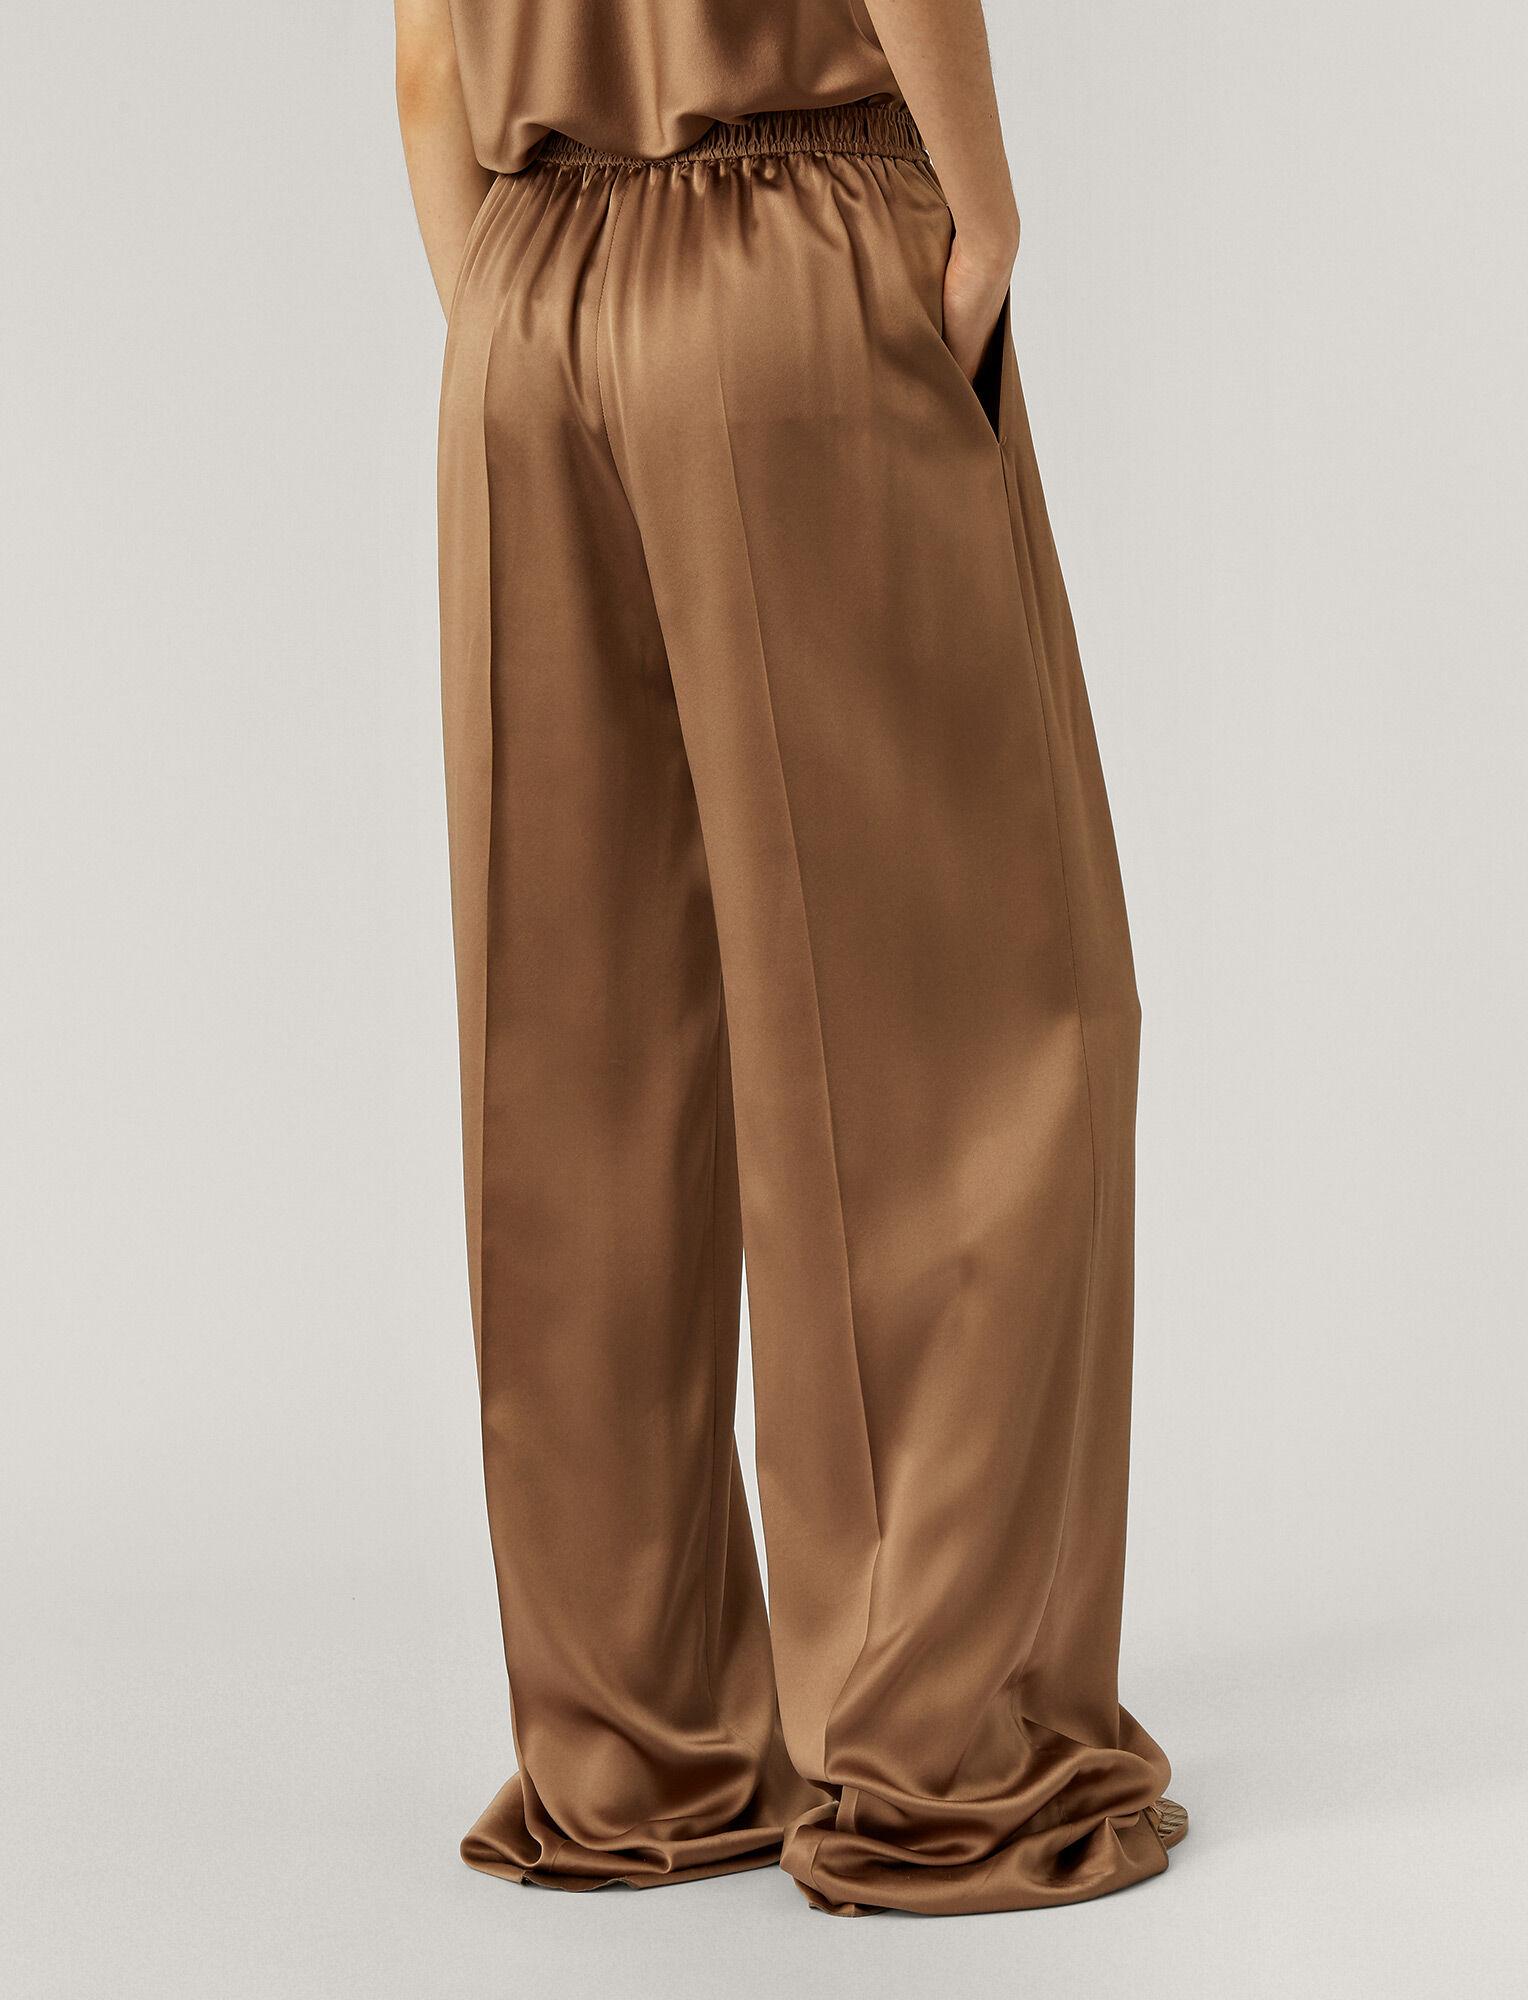 Joseph, Taffy Silk Satin Trousers, in Taupe